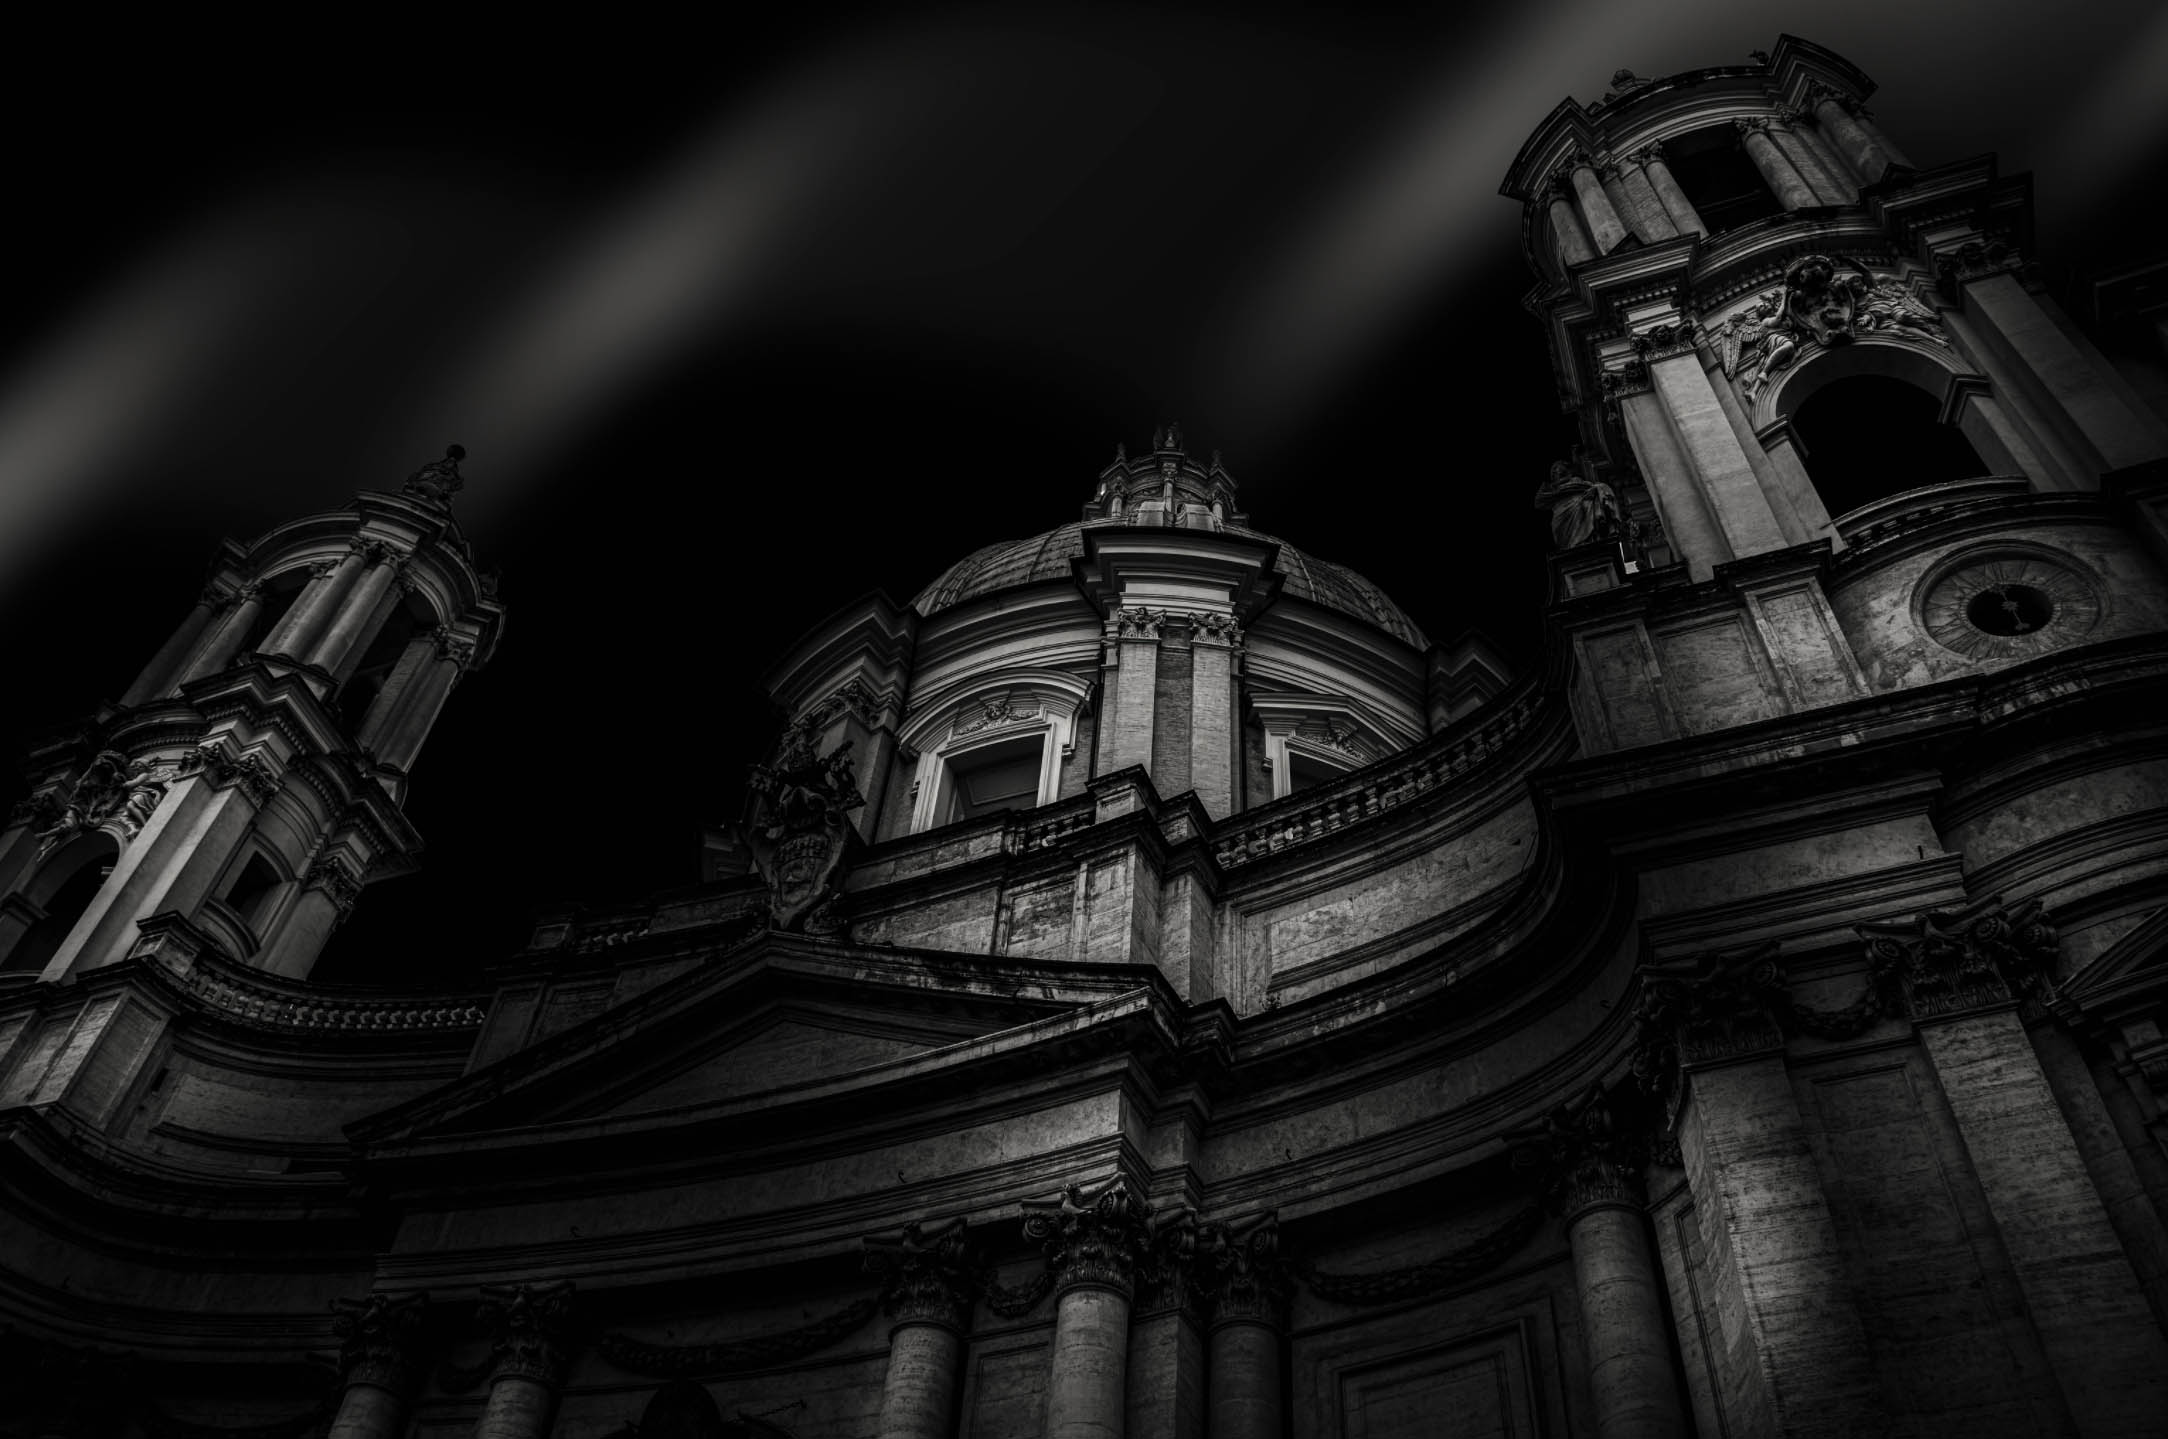 Sant Agnese in Agone - Piazza Navona - Roma